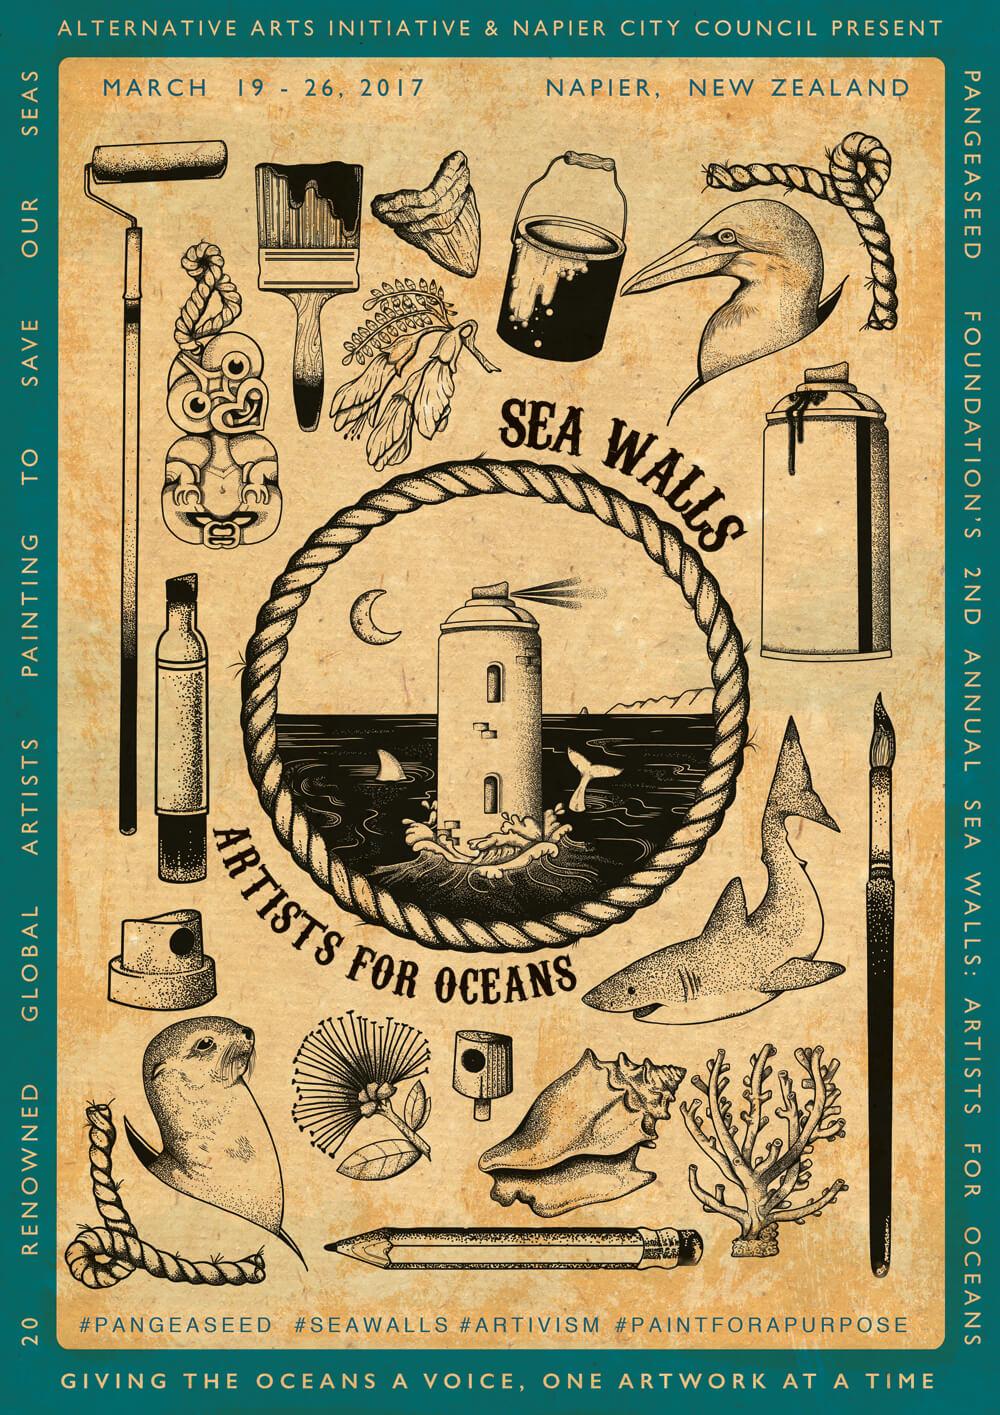 Sea Walls: Artist for Oceans, Napier, New Zealand 2017 ...